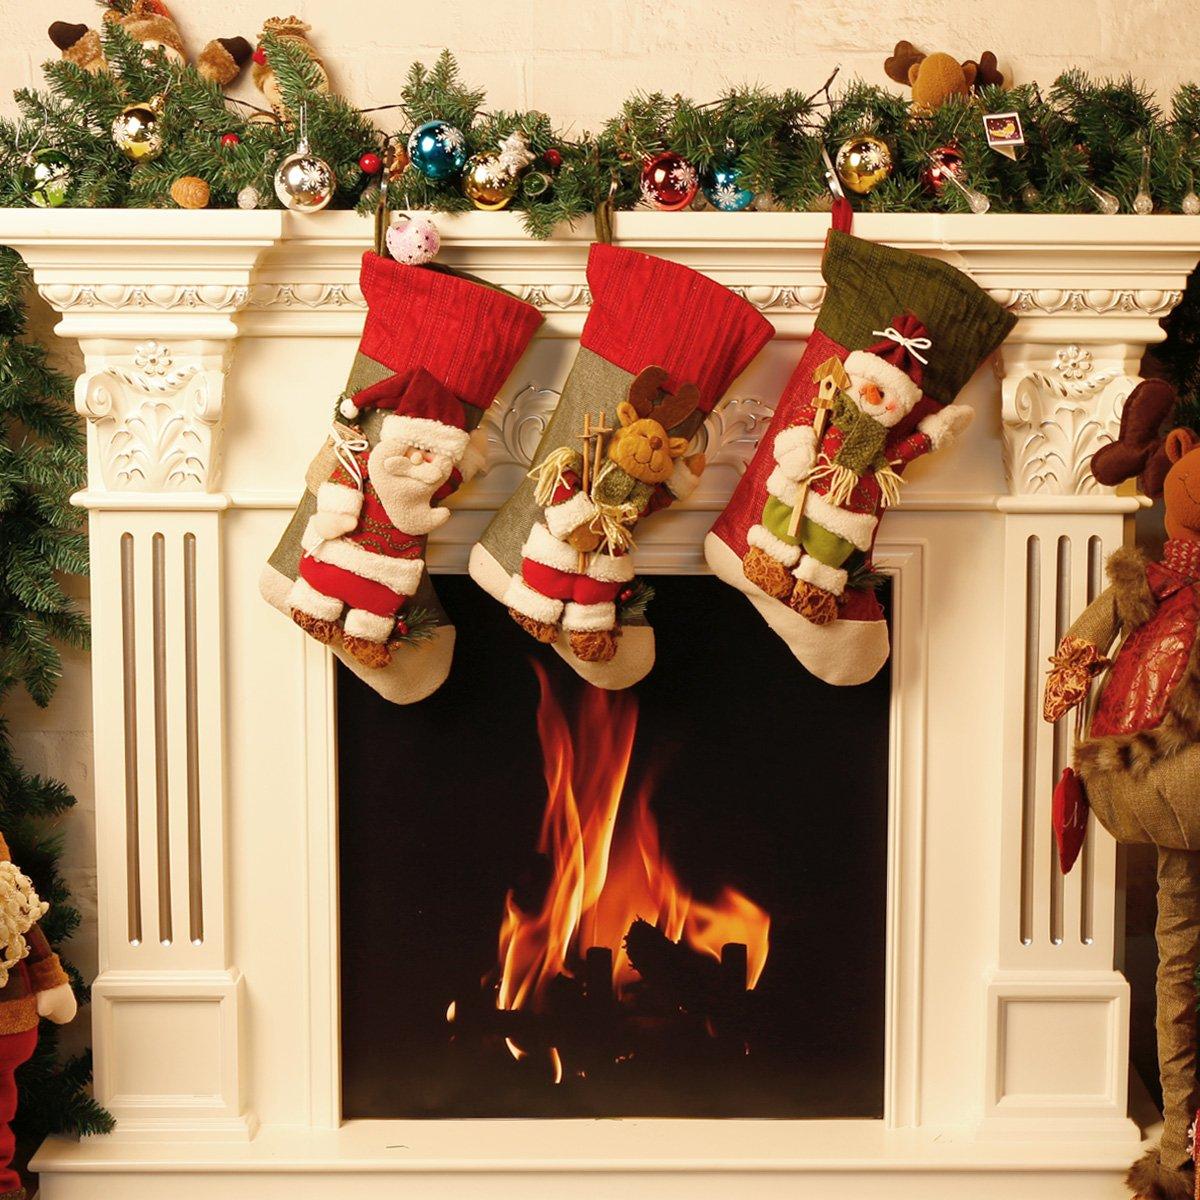 Moonmini 3d grande decorazione Natale Calza idea regalo Hanging Bag Cute Novelty Ornament Craft (Pupazzo di neve)